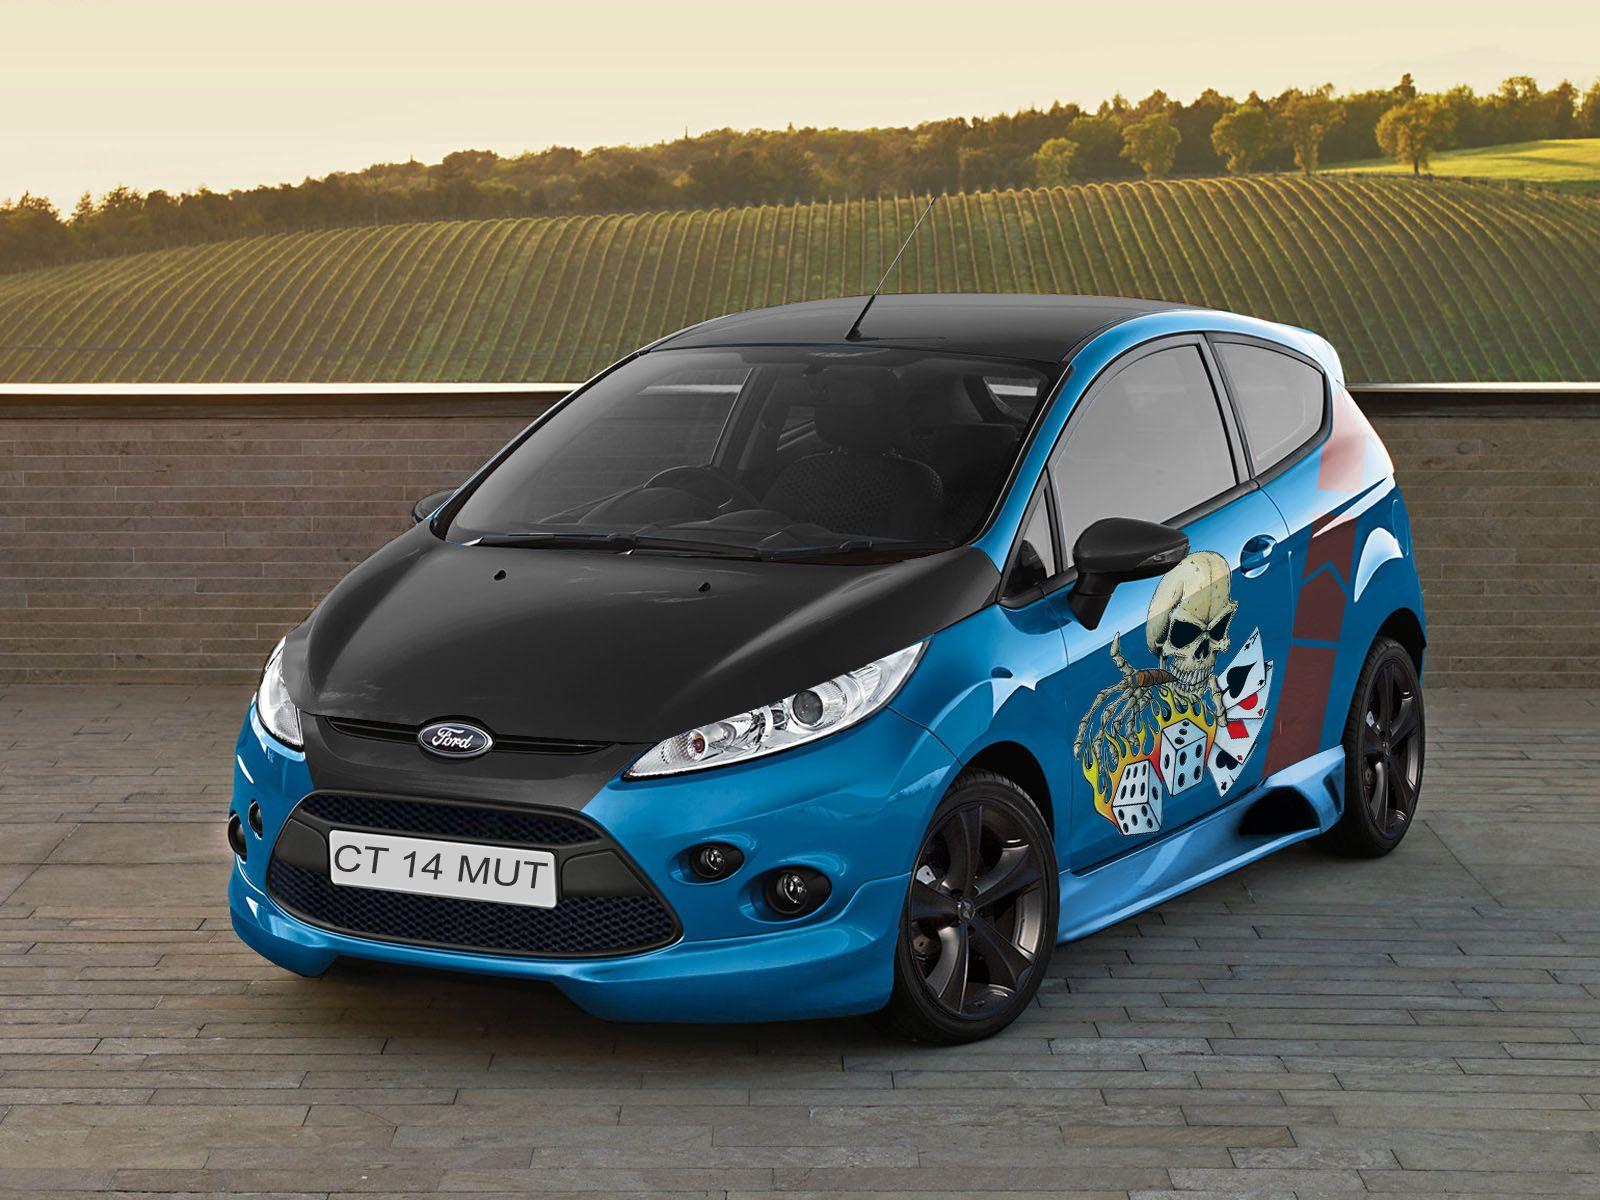 Modifikasi Ford Fiesta Biru